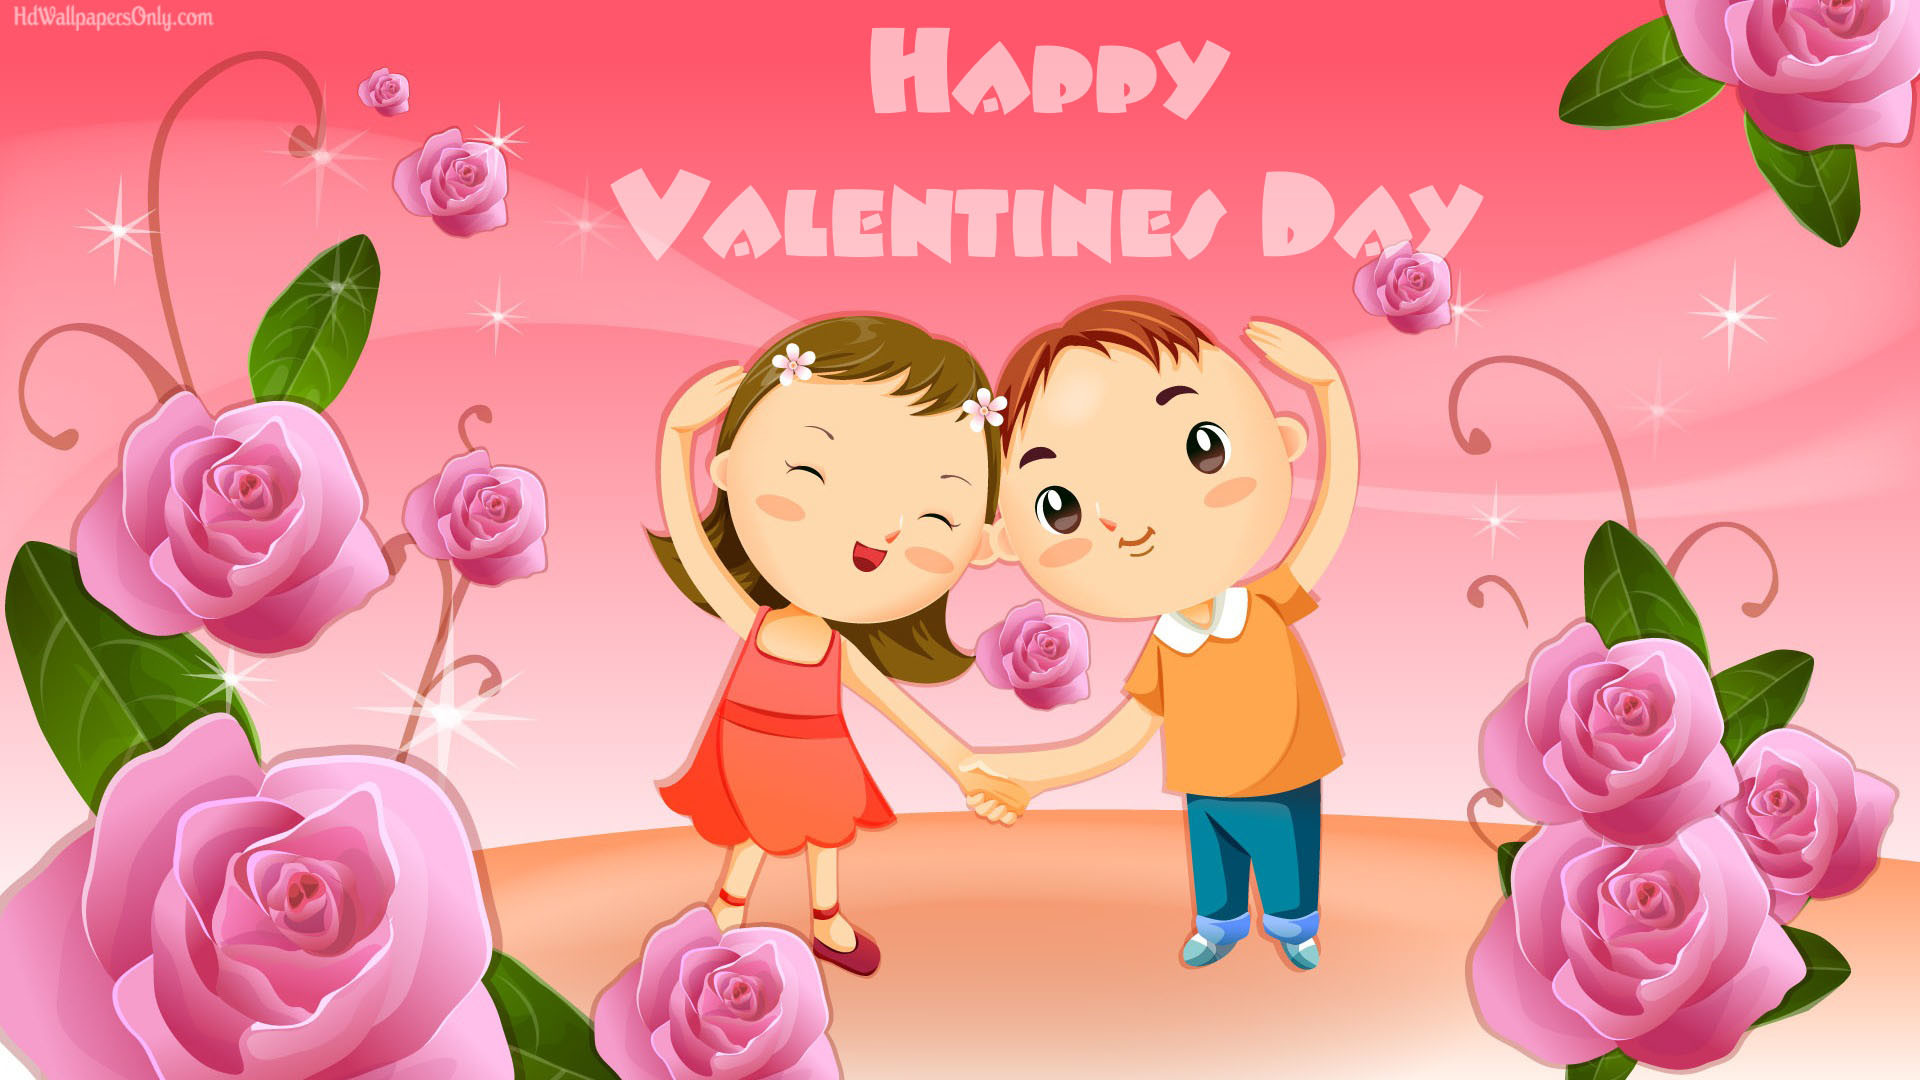 Cute Cartoon Valentine Day 2015 Wallpaper Imag #13269 Wallpaper   High .